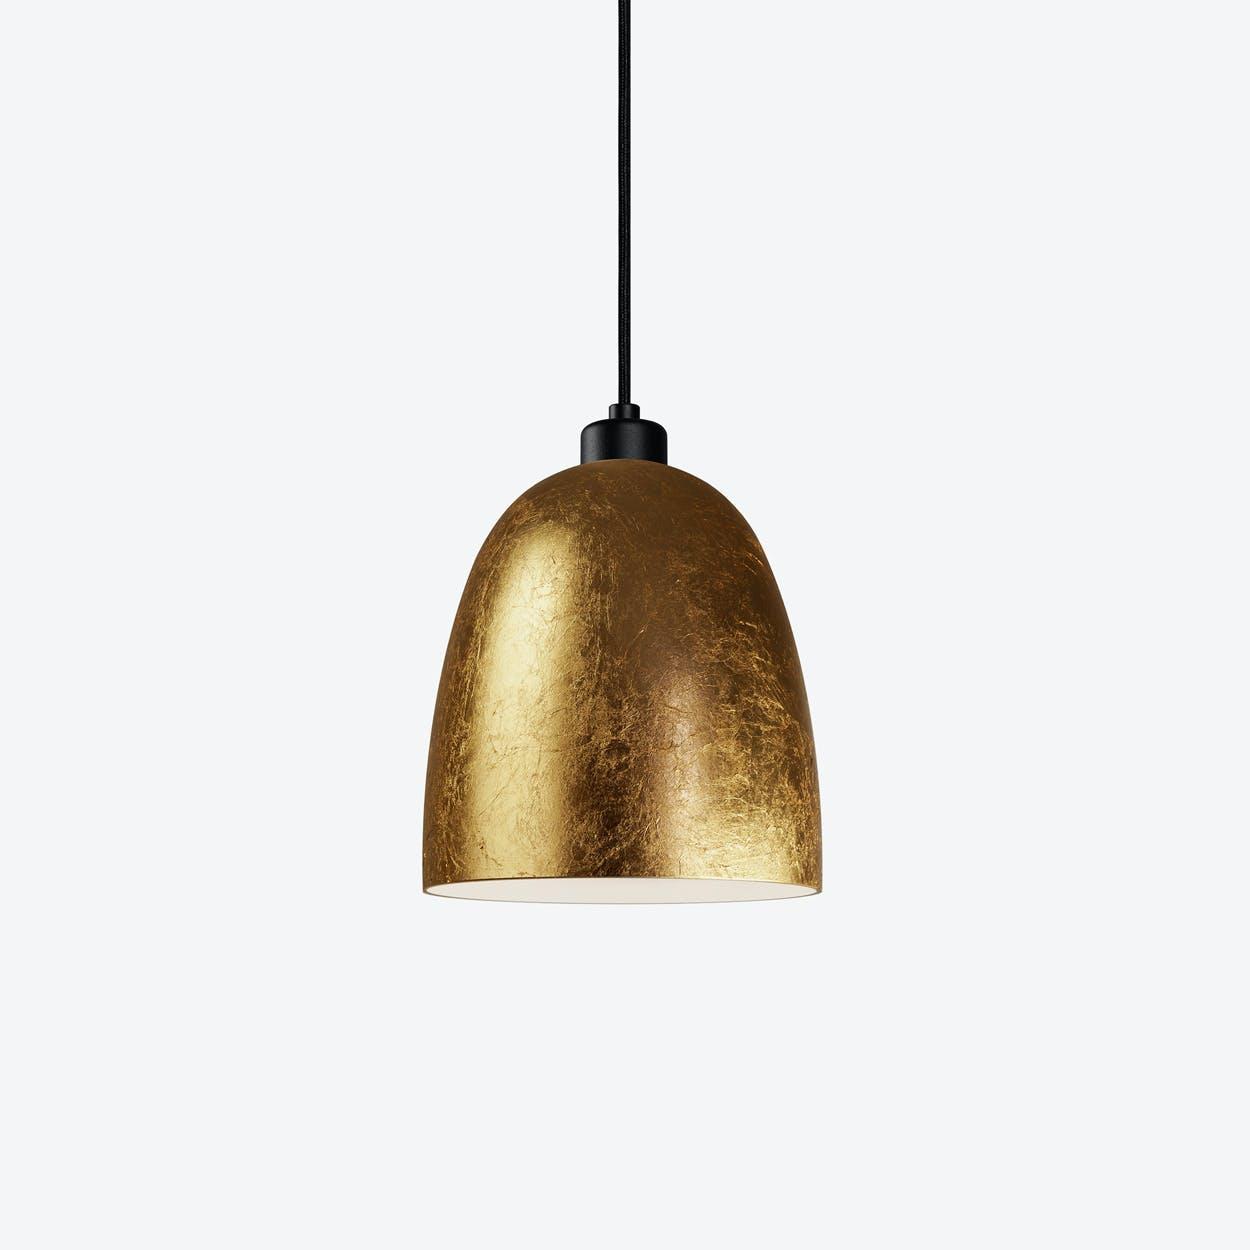 AWA Single Pendant Light in Gold Leaf